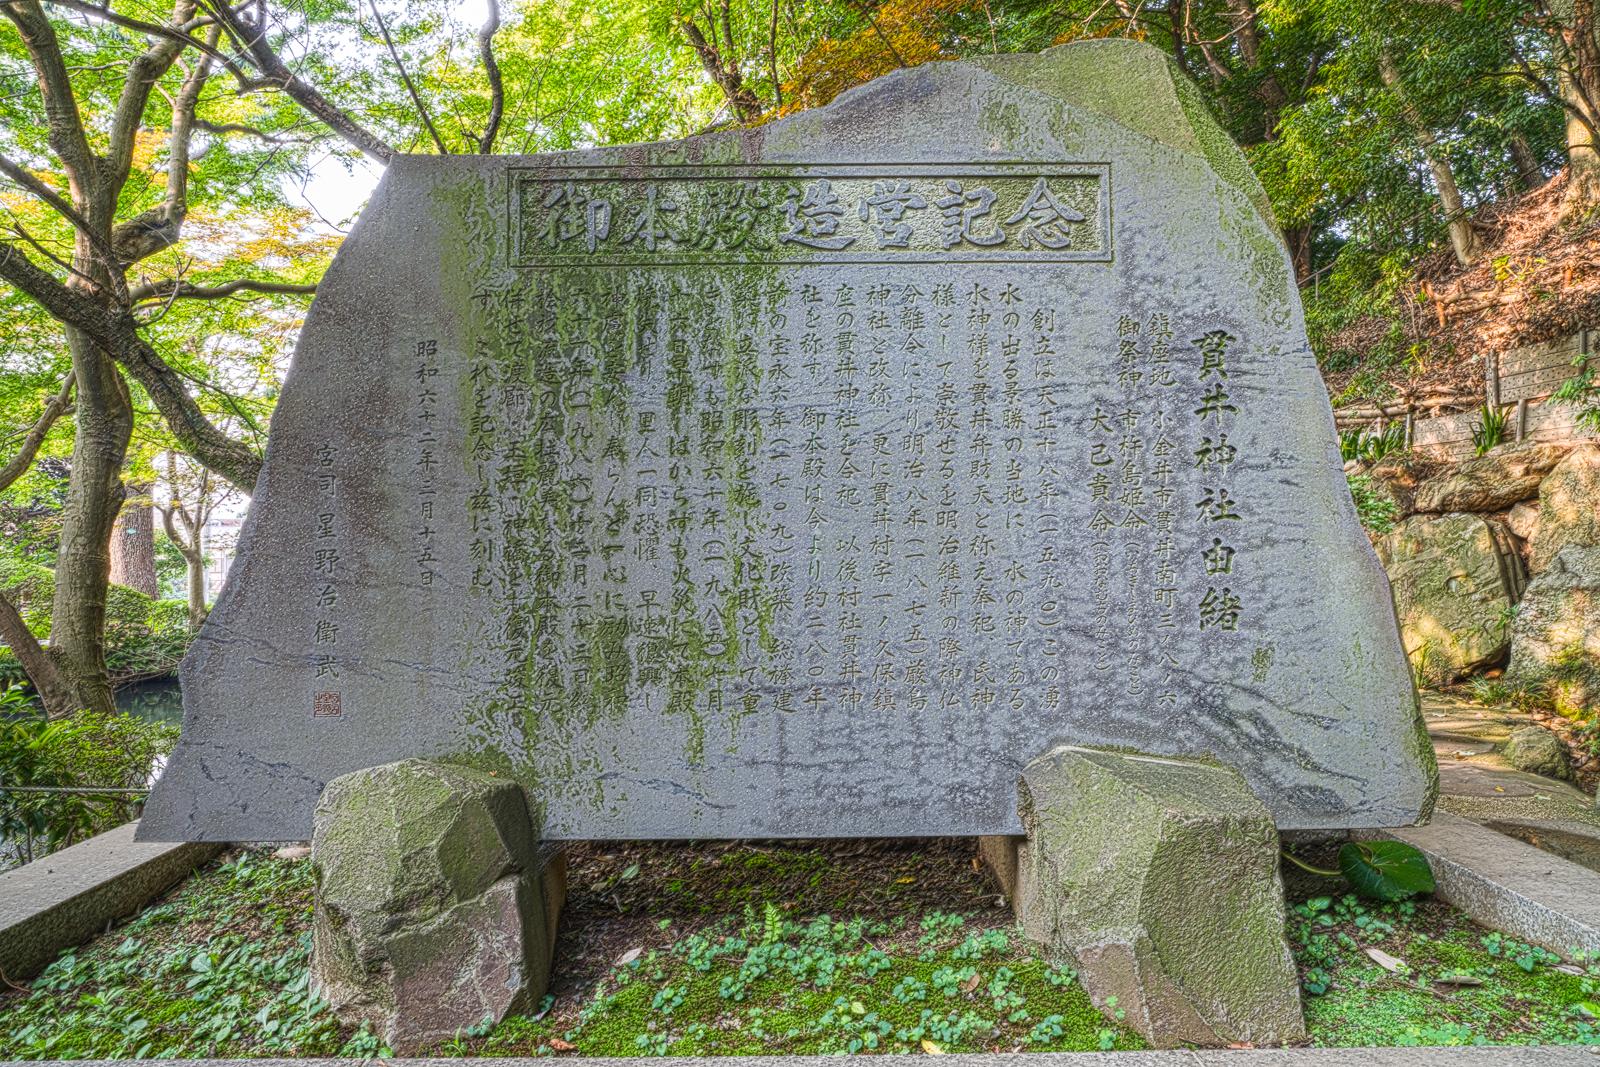 貫井神社の御本殿造営記念碑の写真